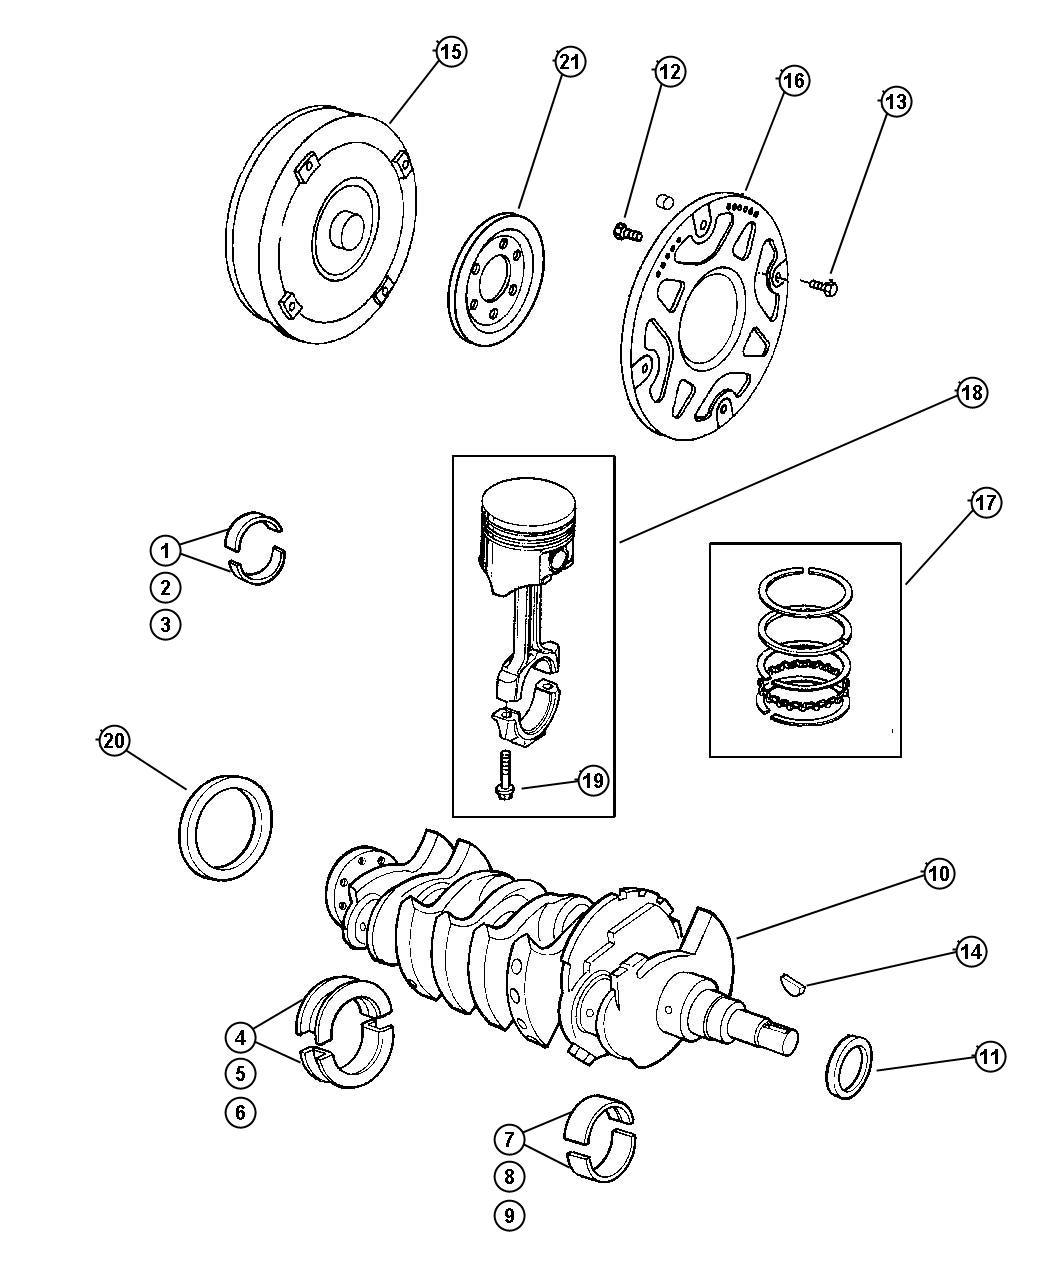 1995 Dodge Neon Seal. Crankshaft oil, front main